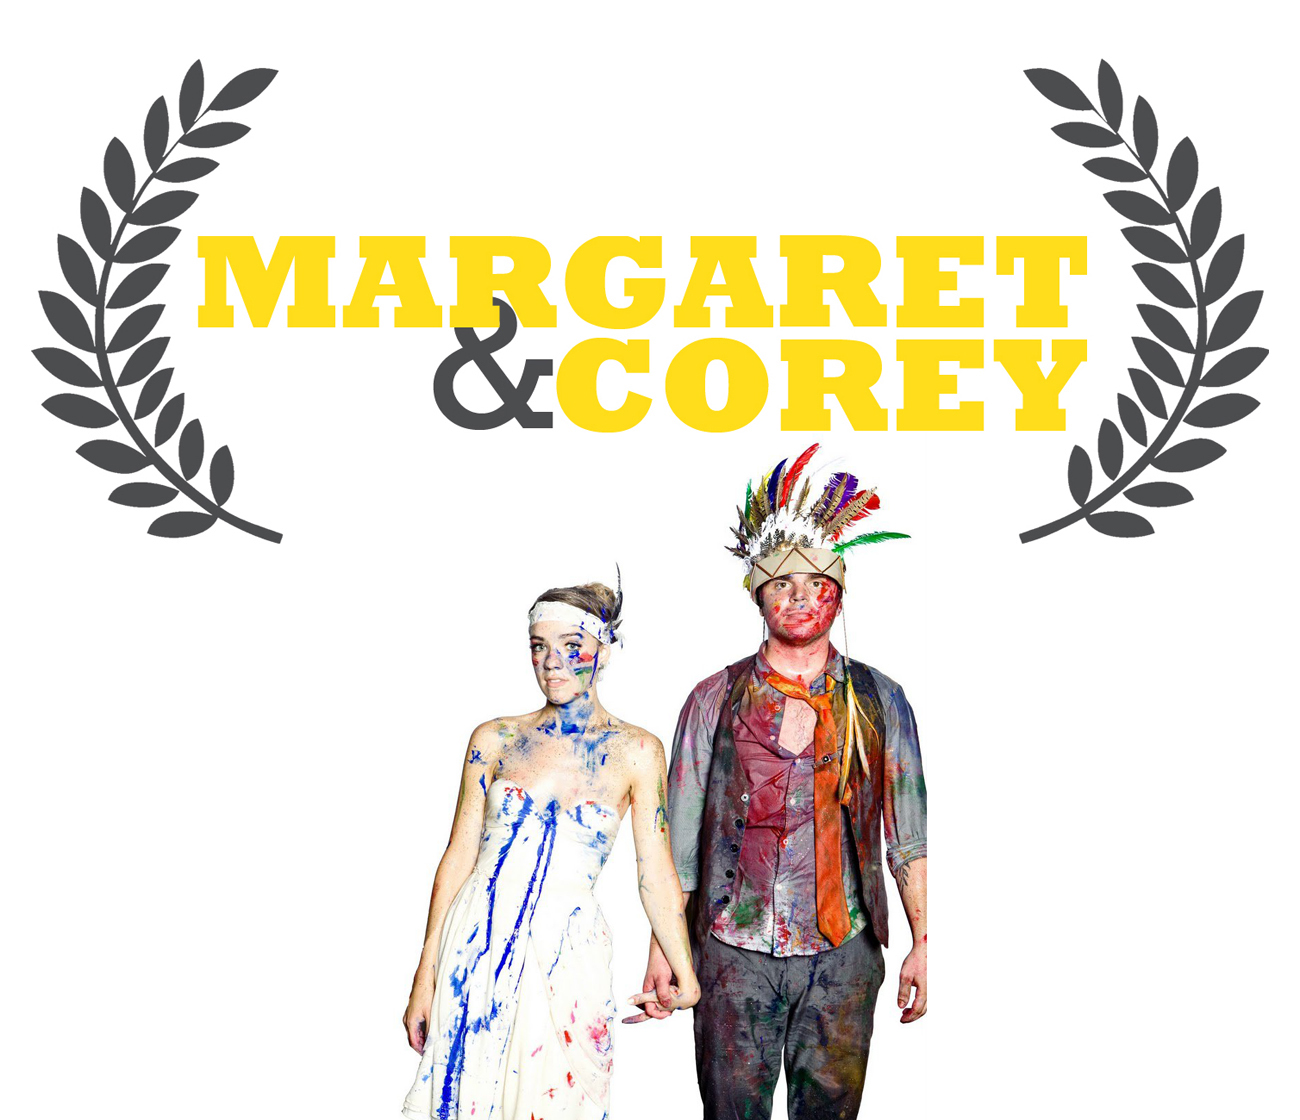 Margaret & Corey